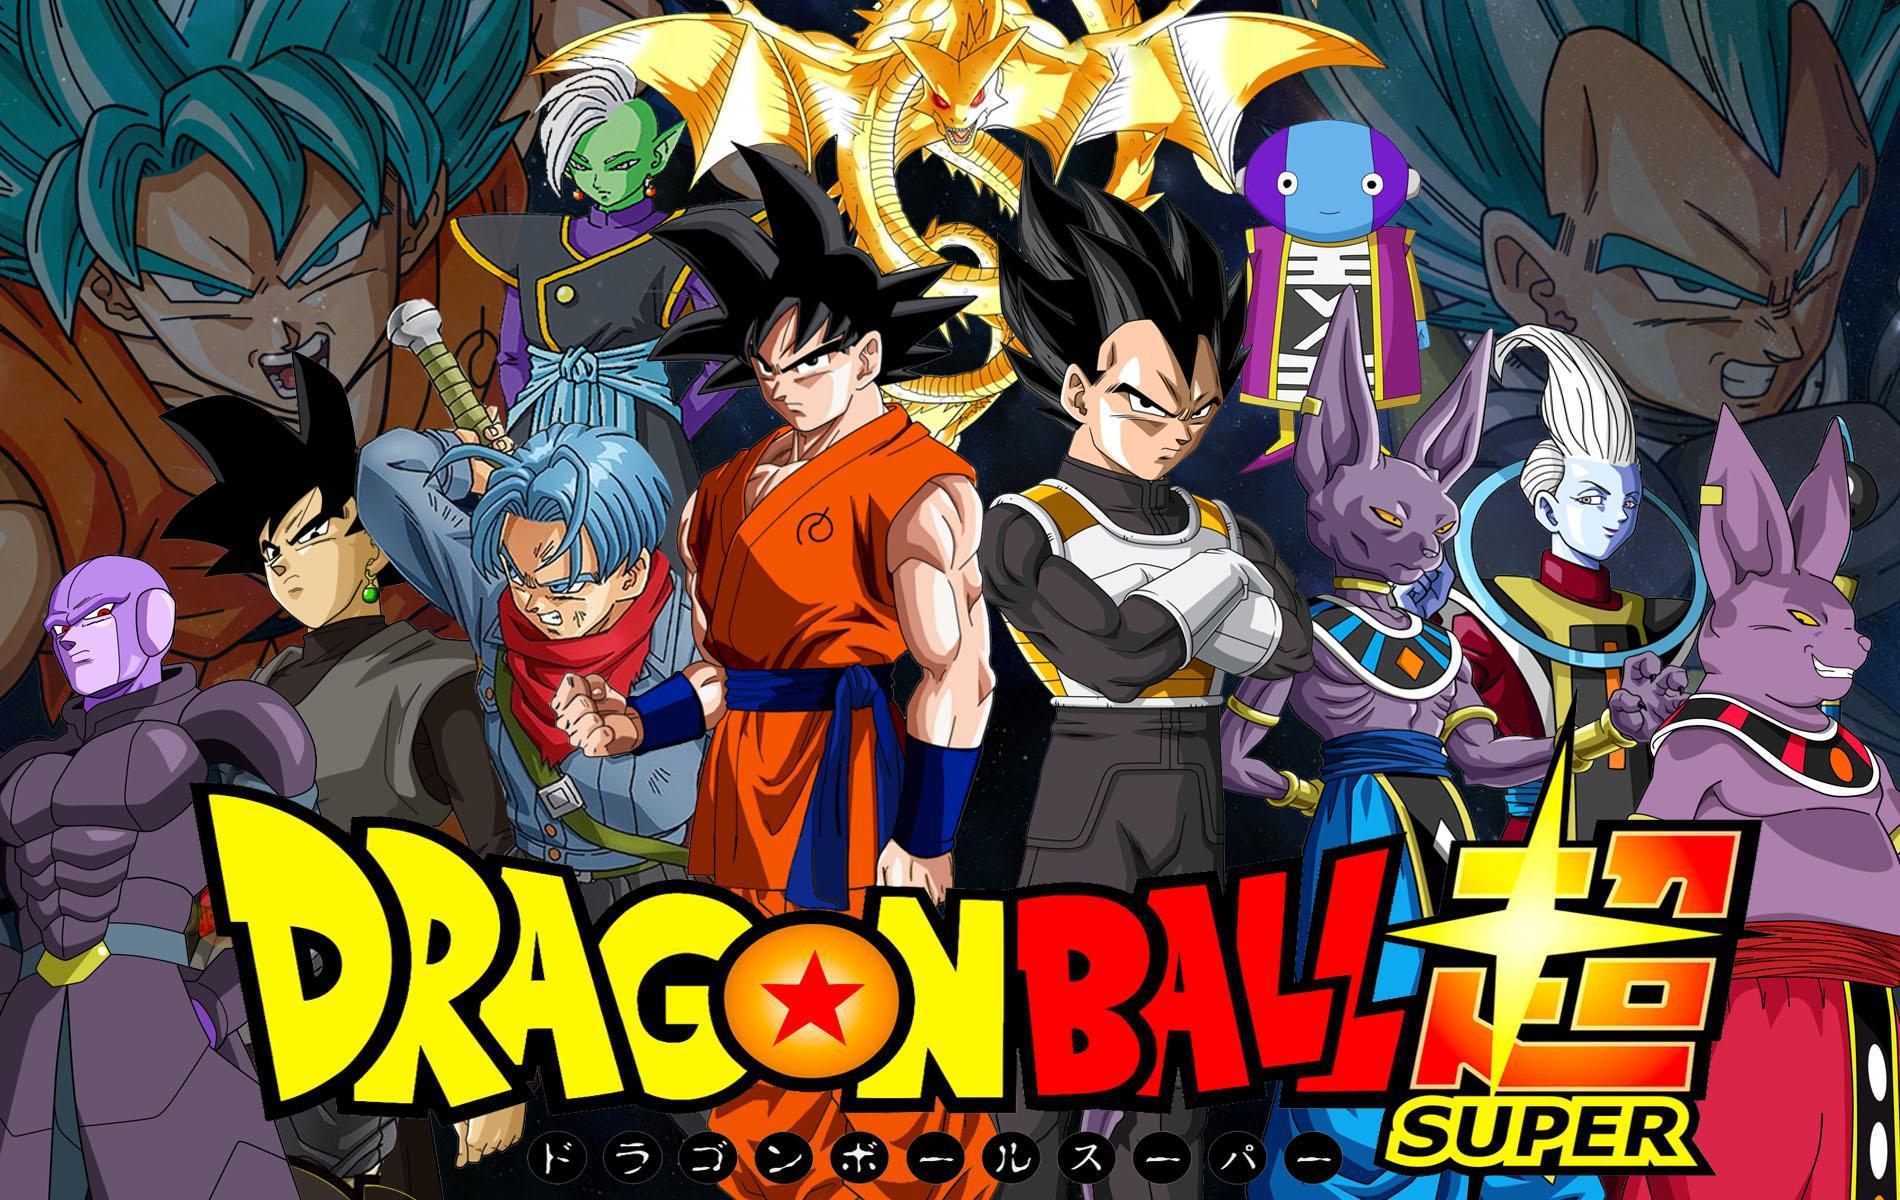 ¿No te gustó Dragon Ball Super? Akira Toriyama ya toma cartas sobre el asunto